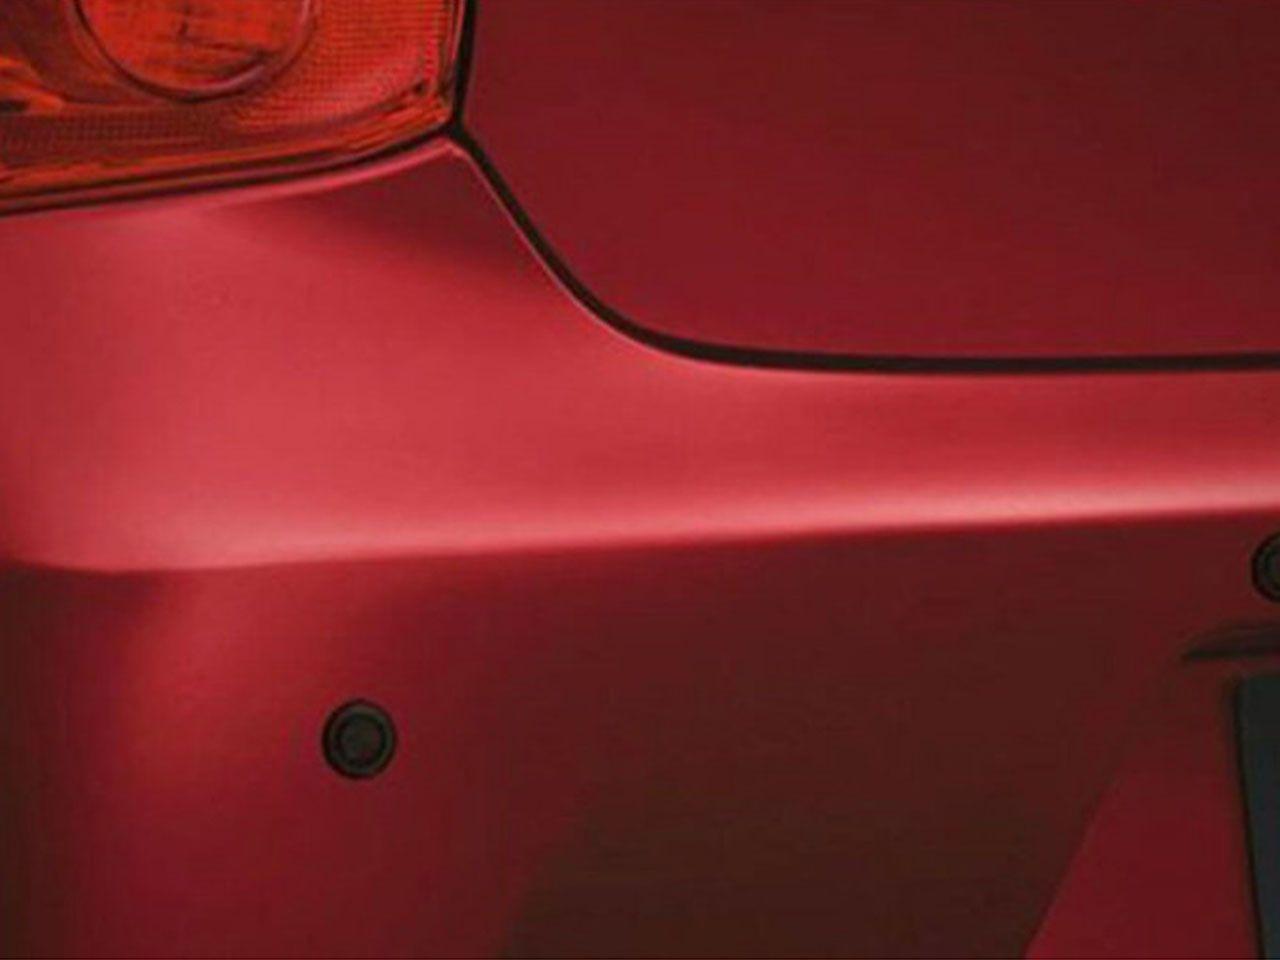 Sensor de Estacionamento Traseiro Genuíno Etios Sedã X  - Mirai Peças Toyota